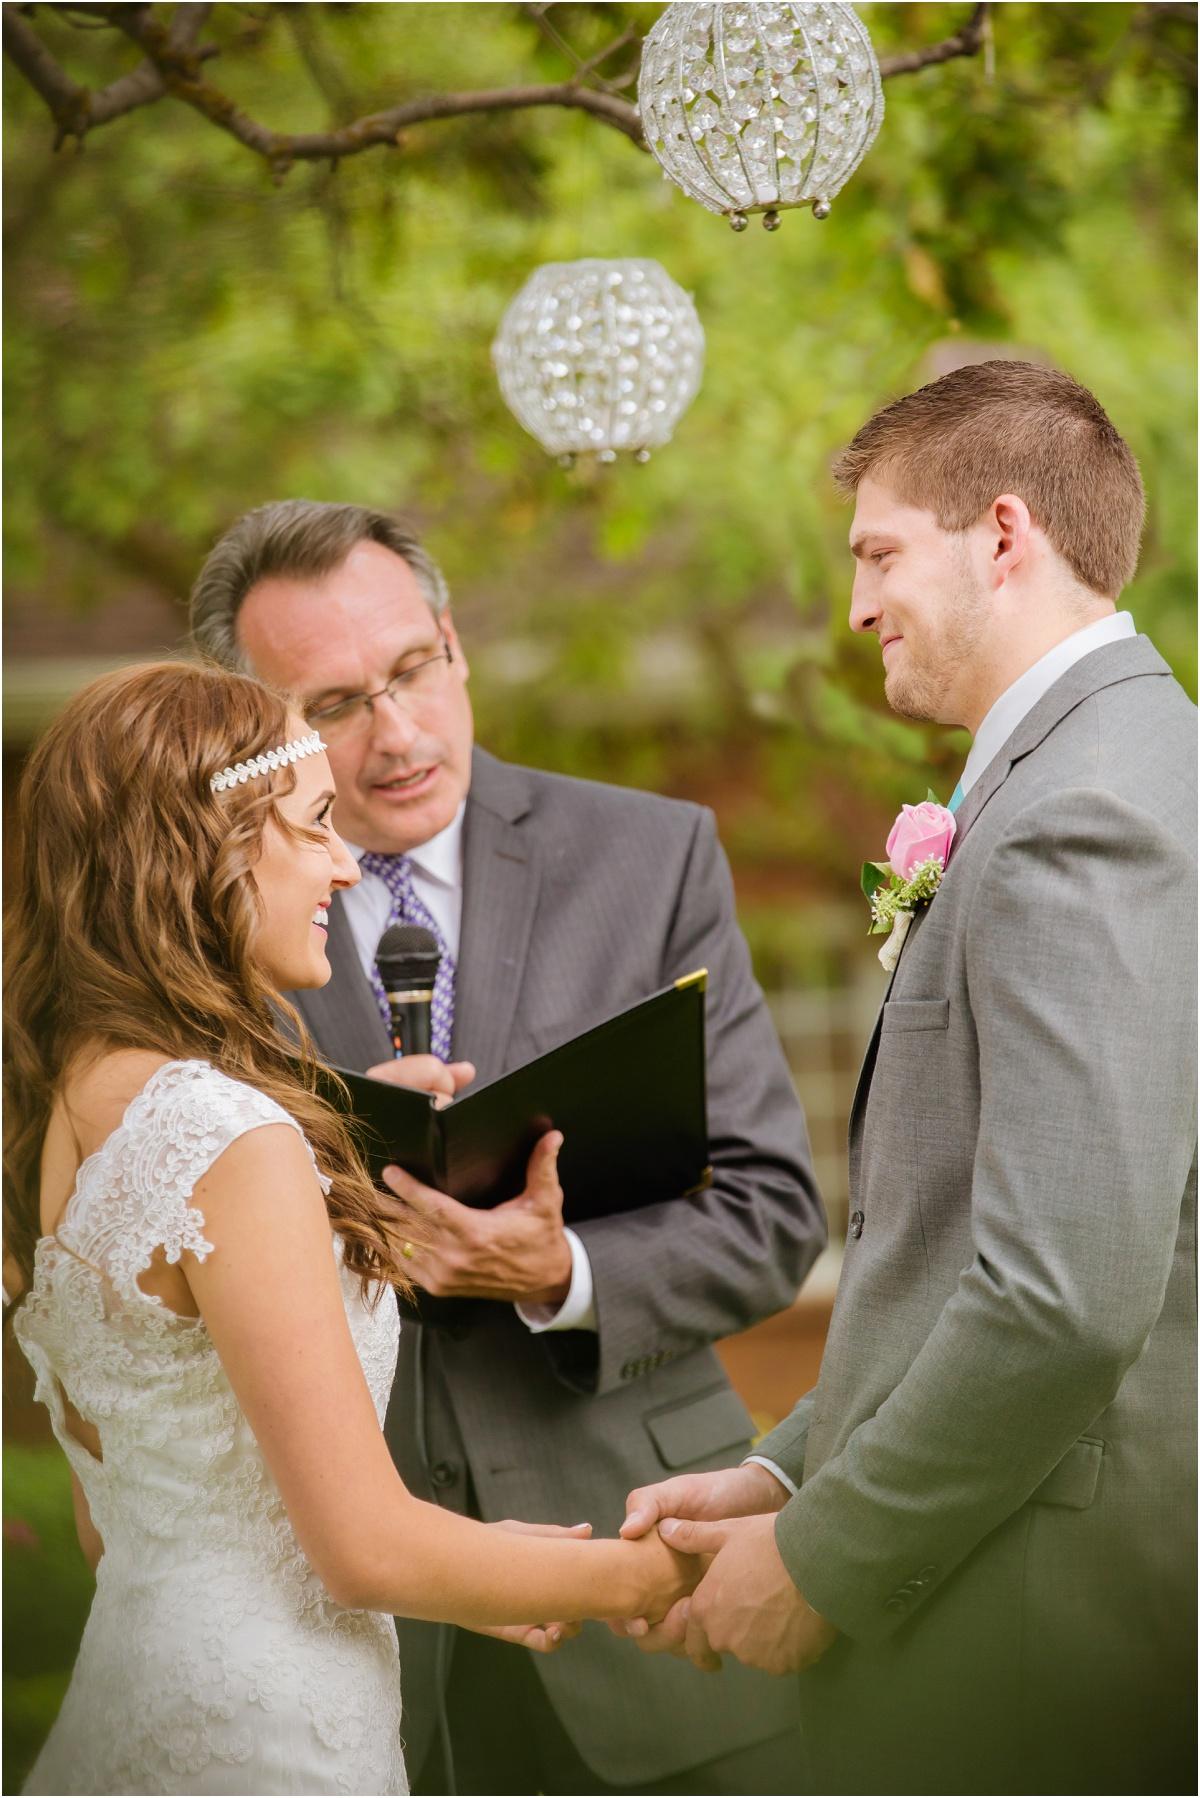 Davis County Private Venue Wedding Terra Cooper Photography_3463.jpg